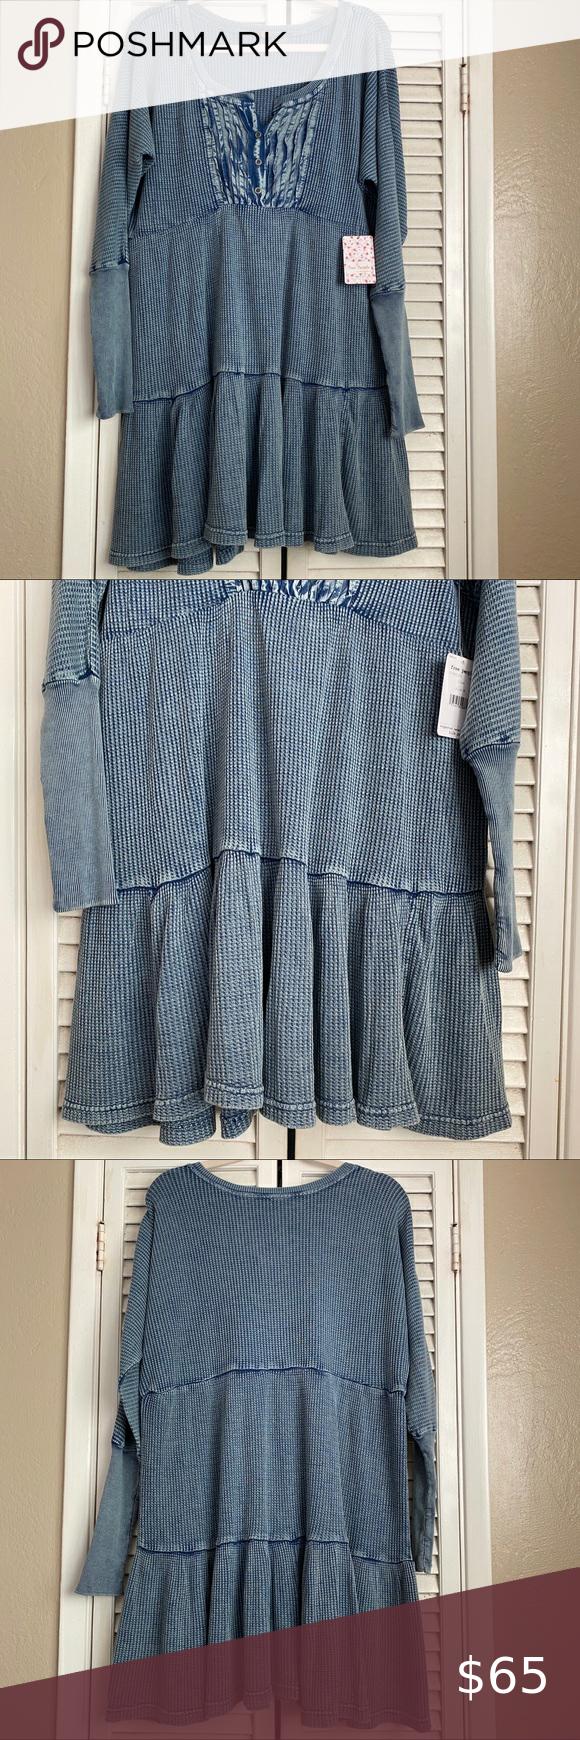 Nwt Free People Jolene Waffle Knit Dress Knit Dress Waffle Knit Dresses [ 1740 x 580 Pixel ]